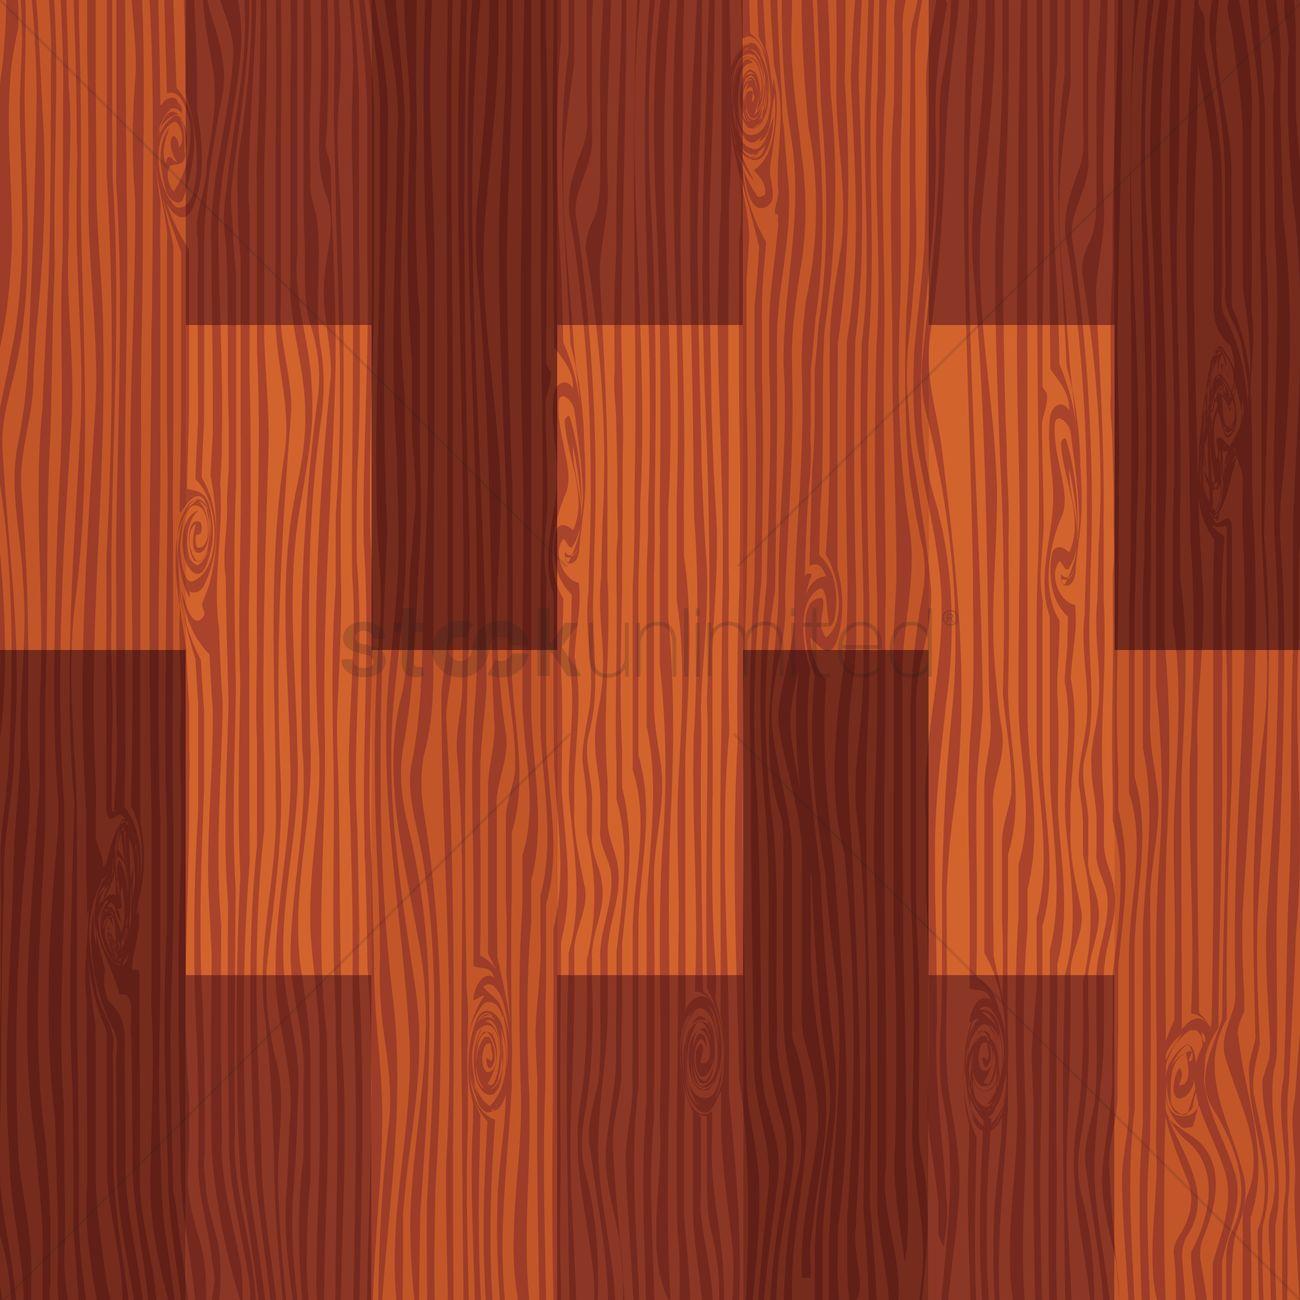 Wooden bricks texture Vector Image - 1430182   StockUnlimited